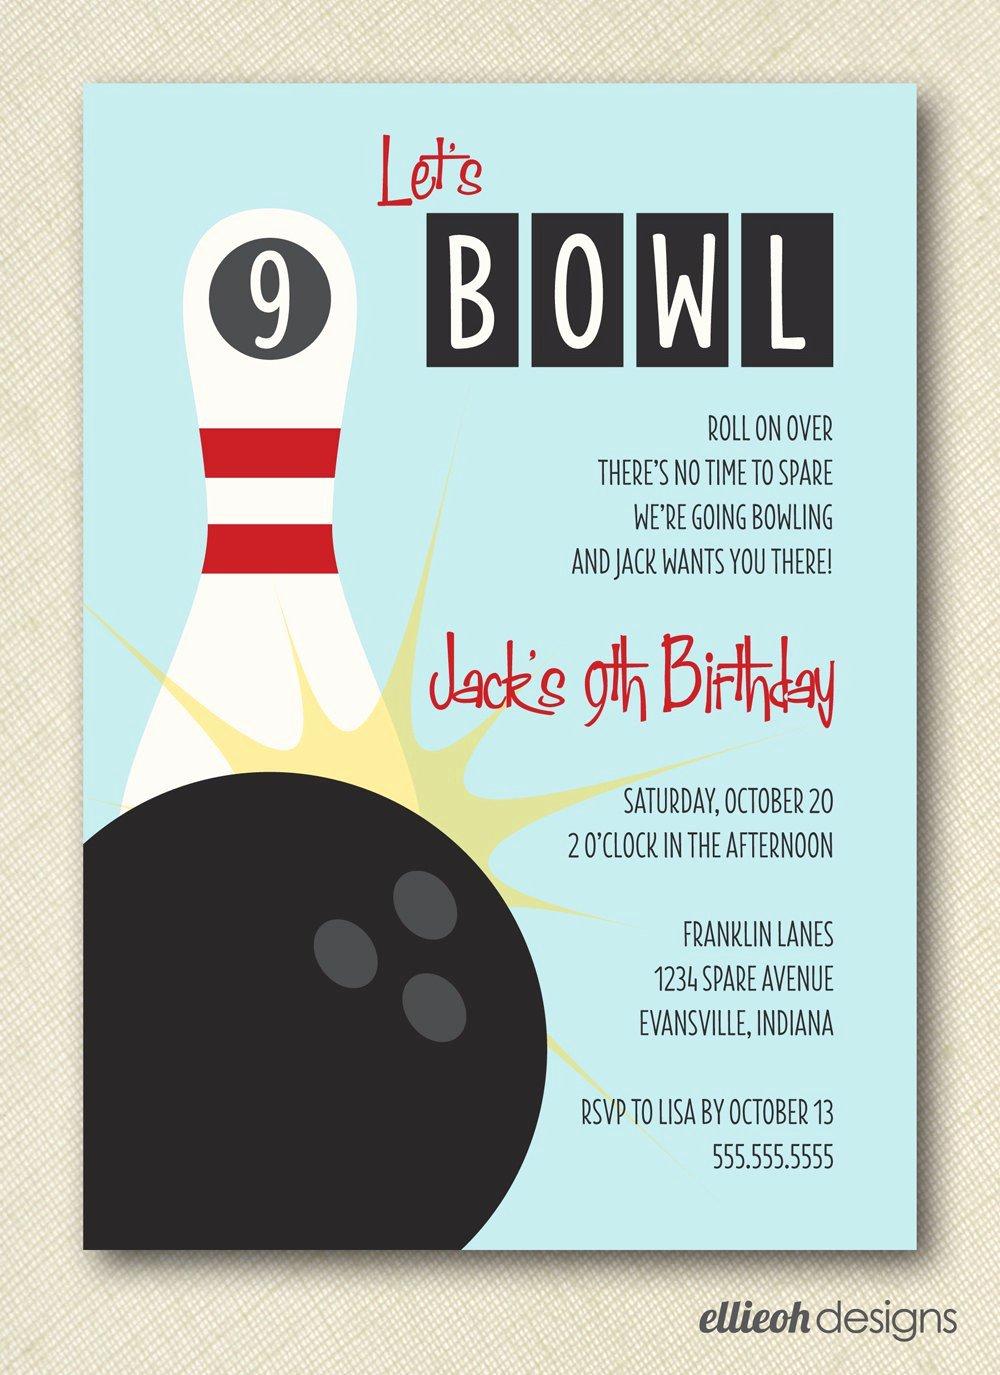 Bowling Invitation Template Free Unique Free Printable Bowling Party Invitation Templates